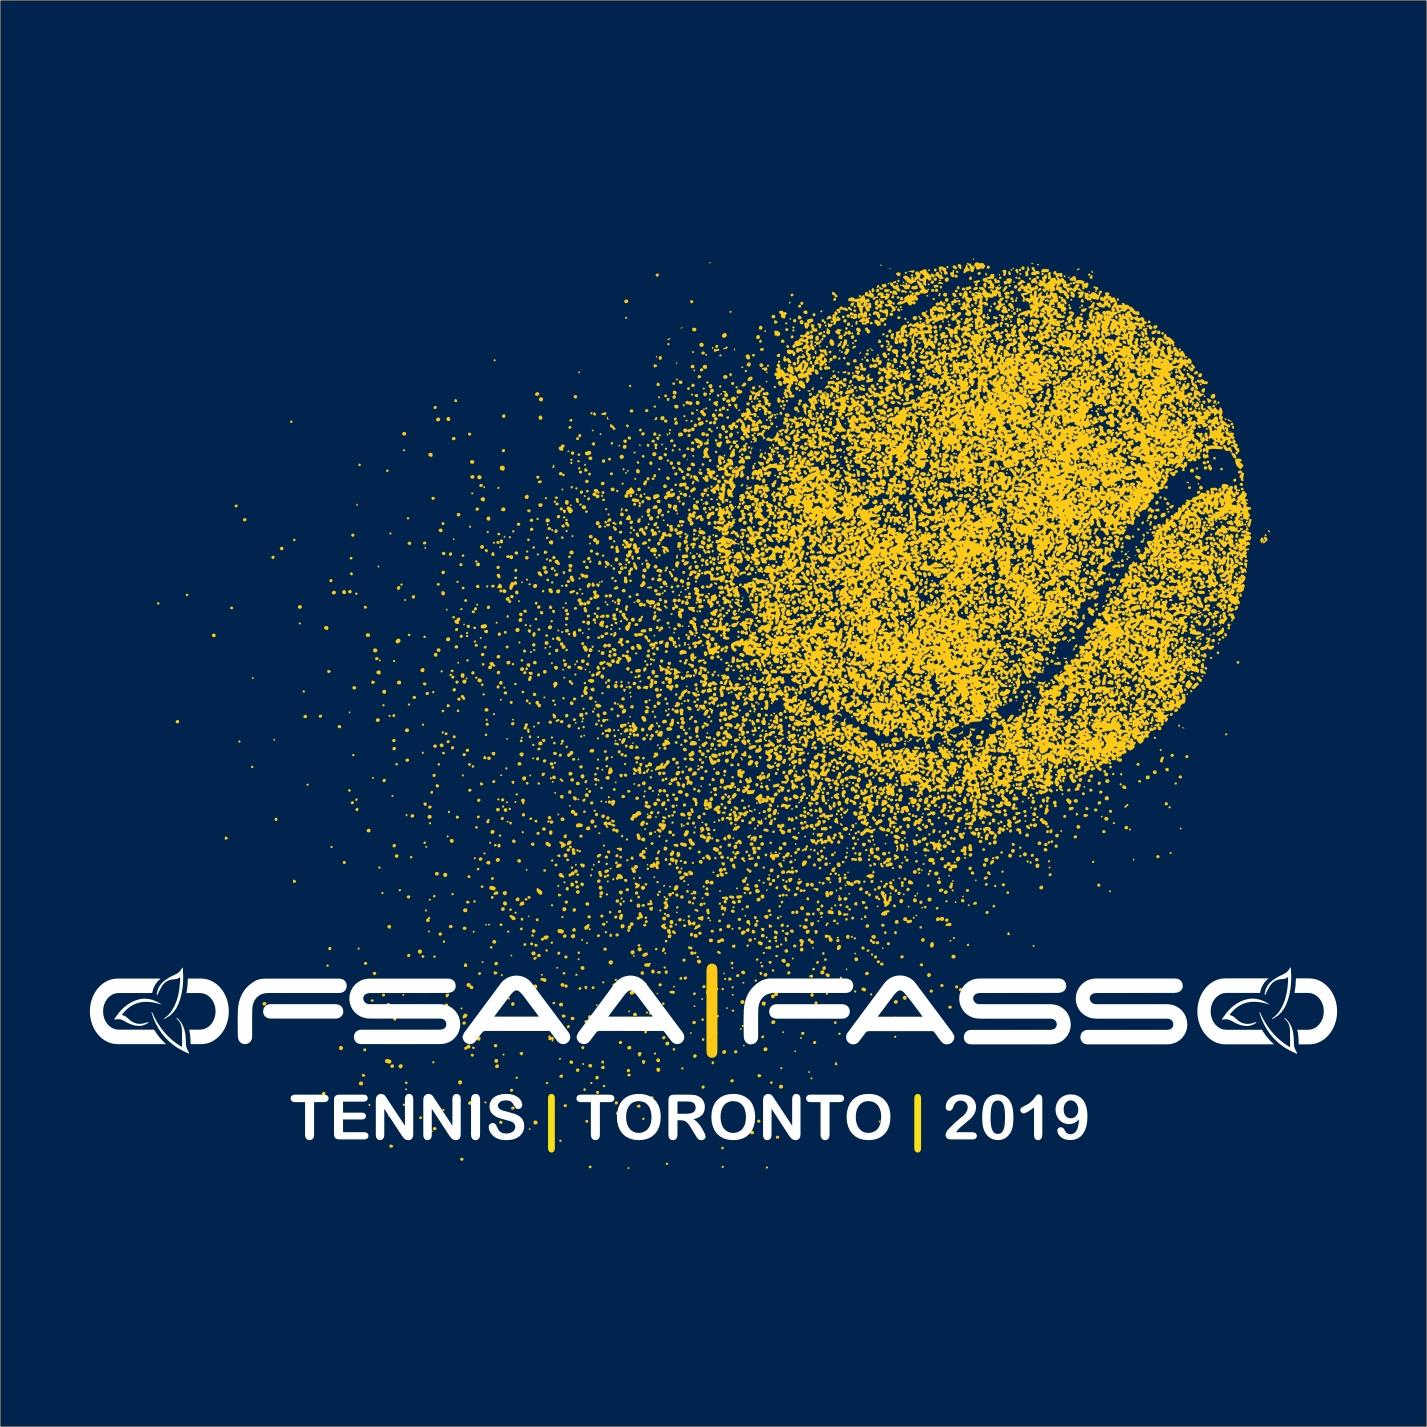 2019 Tennis logo navy.jpg